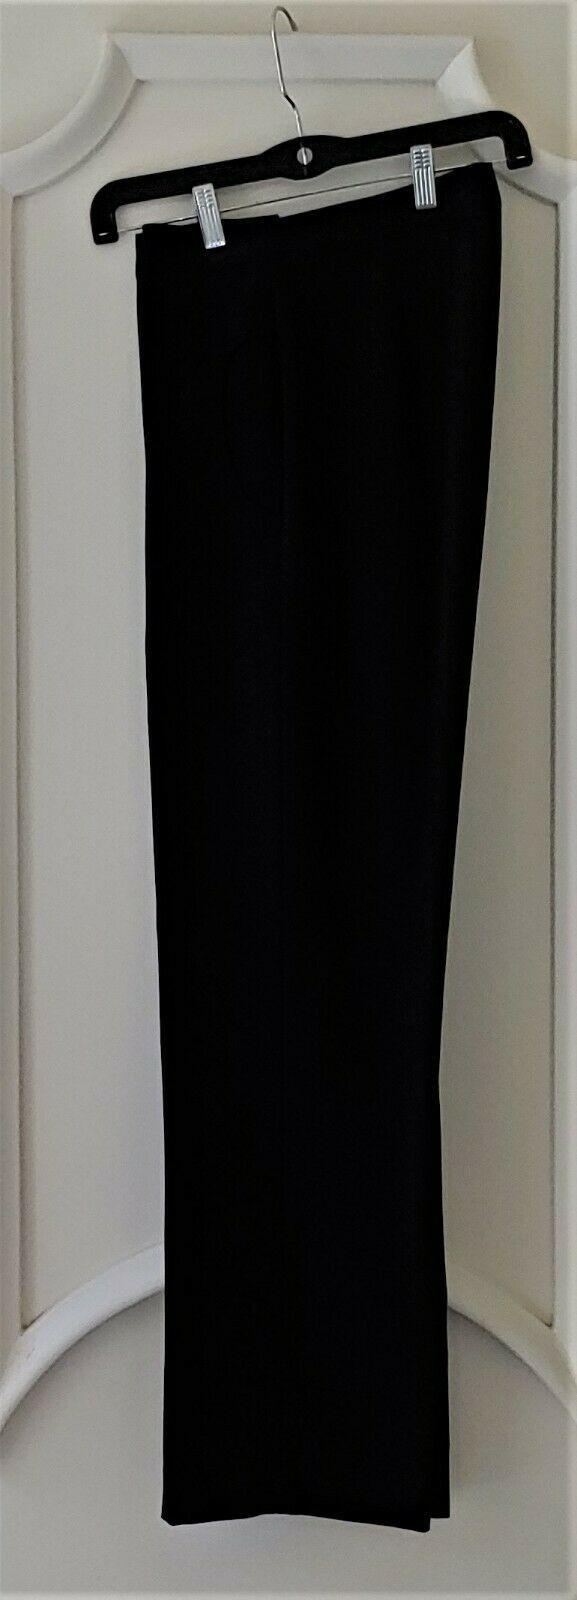 Stylish Women's Golf & Casual Sleeveless White Mock Polo, Rhinestone Zipper image 6